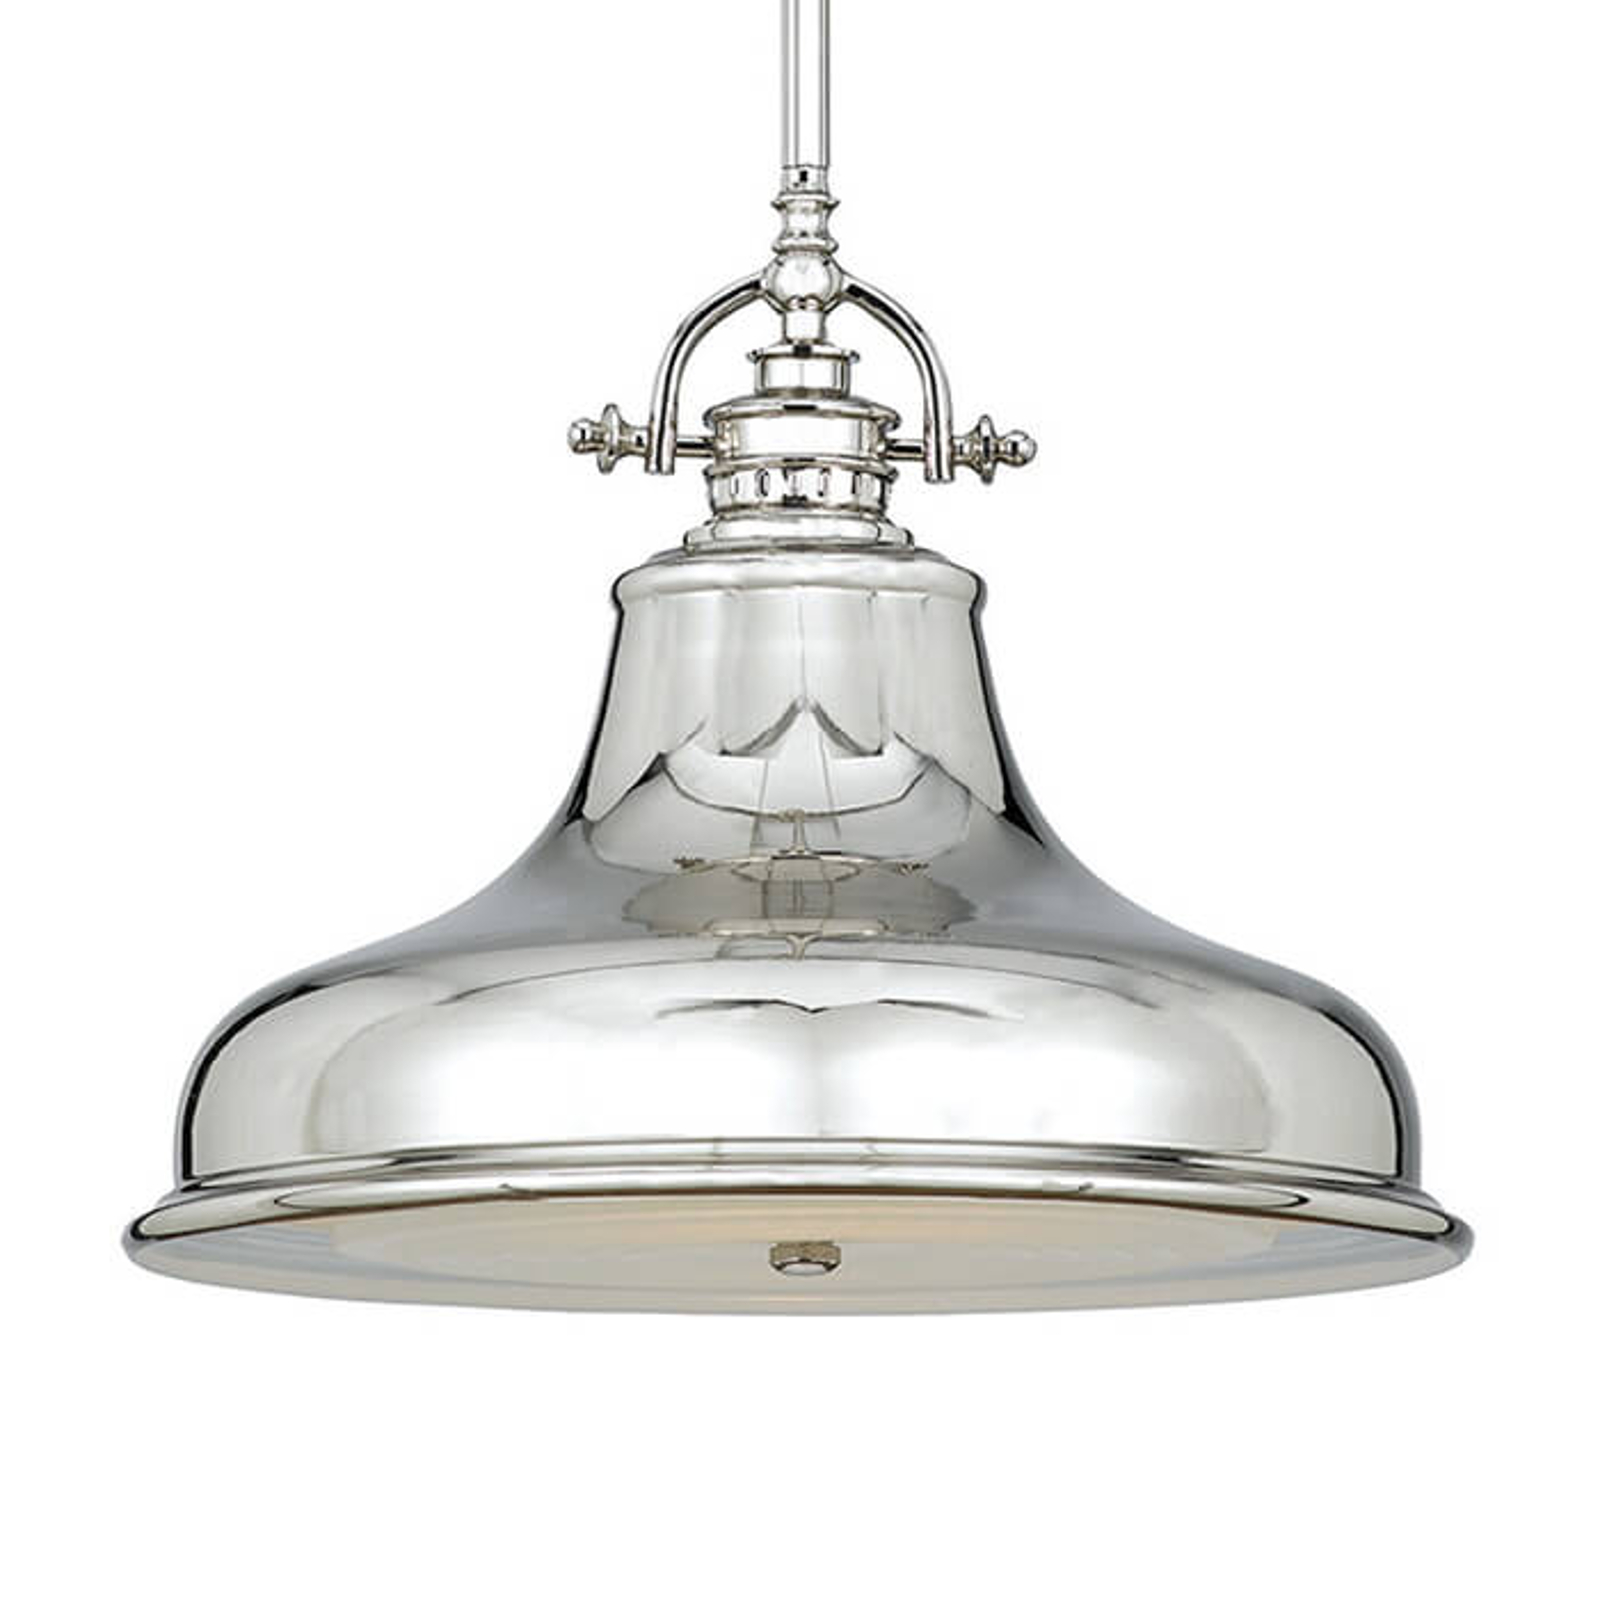 Lampada sospensione Emery 1 luce argento Ø 34,3 cm